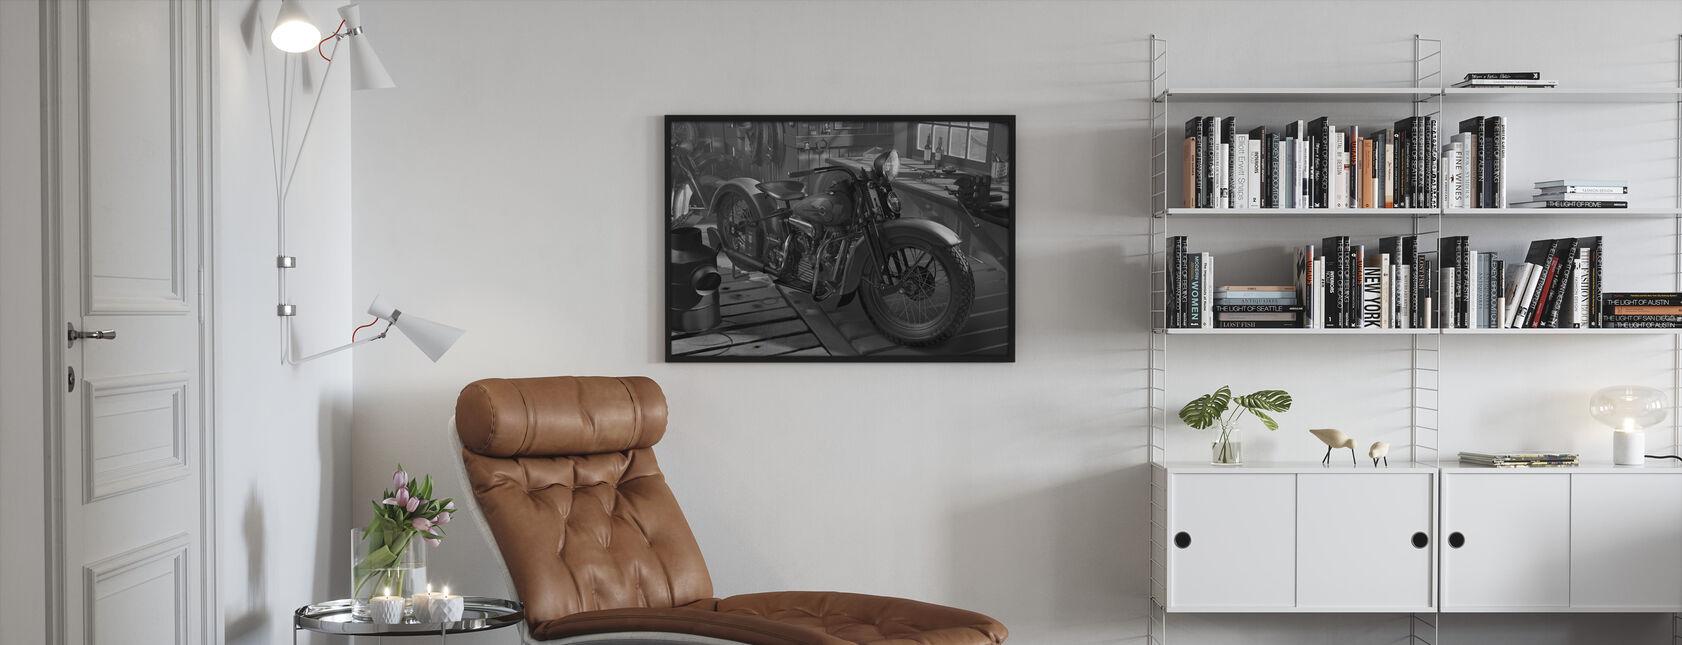 Vanha Lato BW - Kehystetty kuva - Olohuone